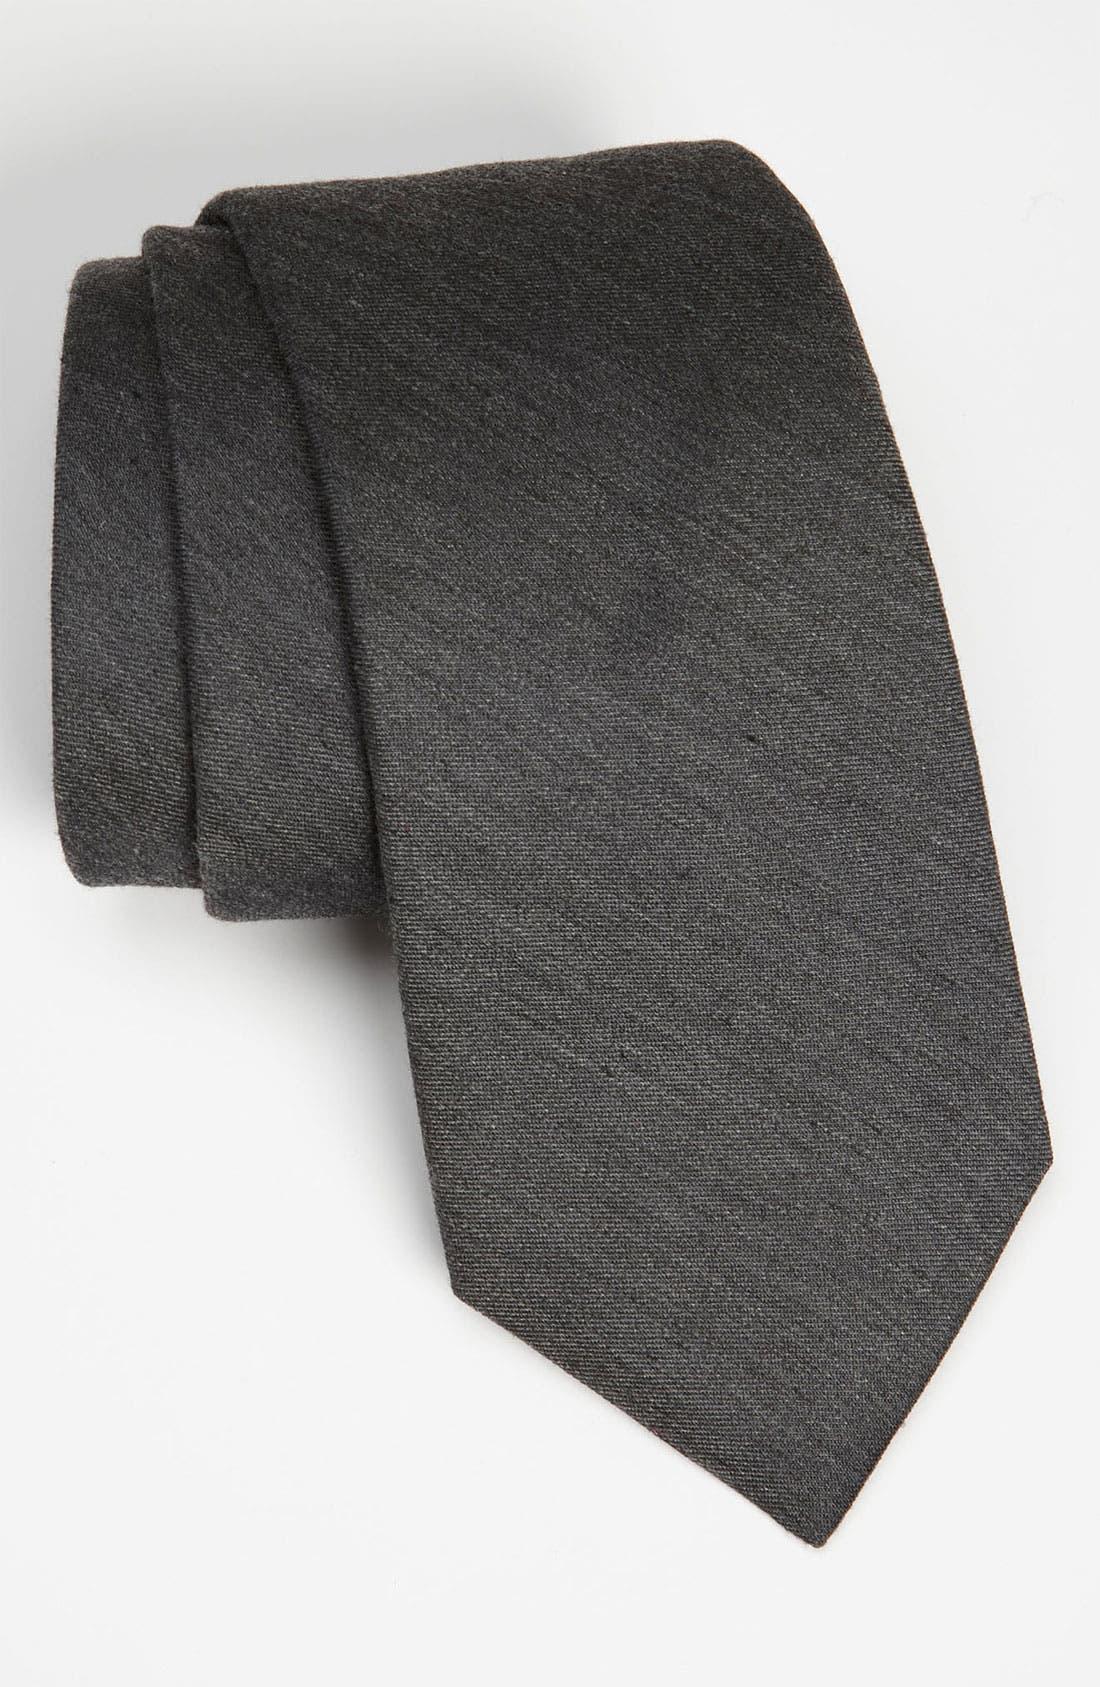 Main Image - Michael Kors Woven Silk Blend Tie